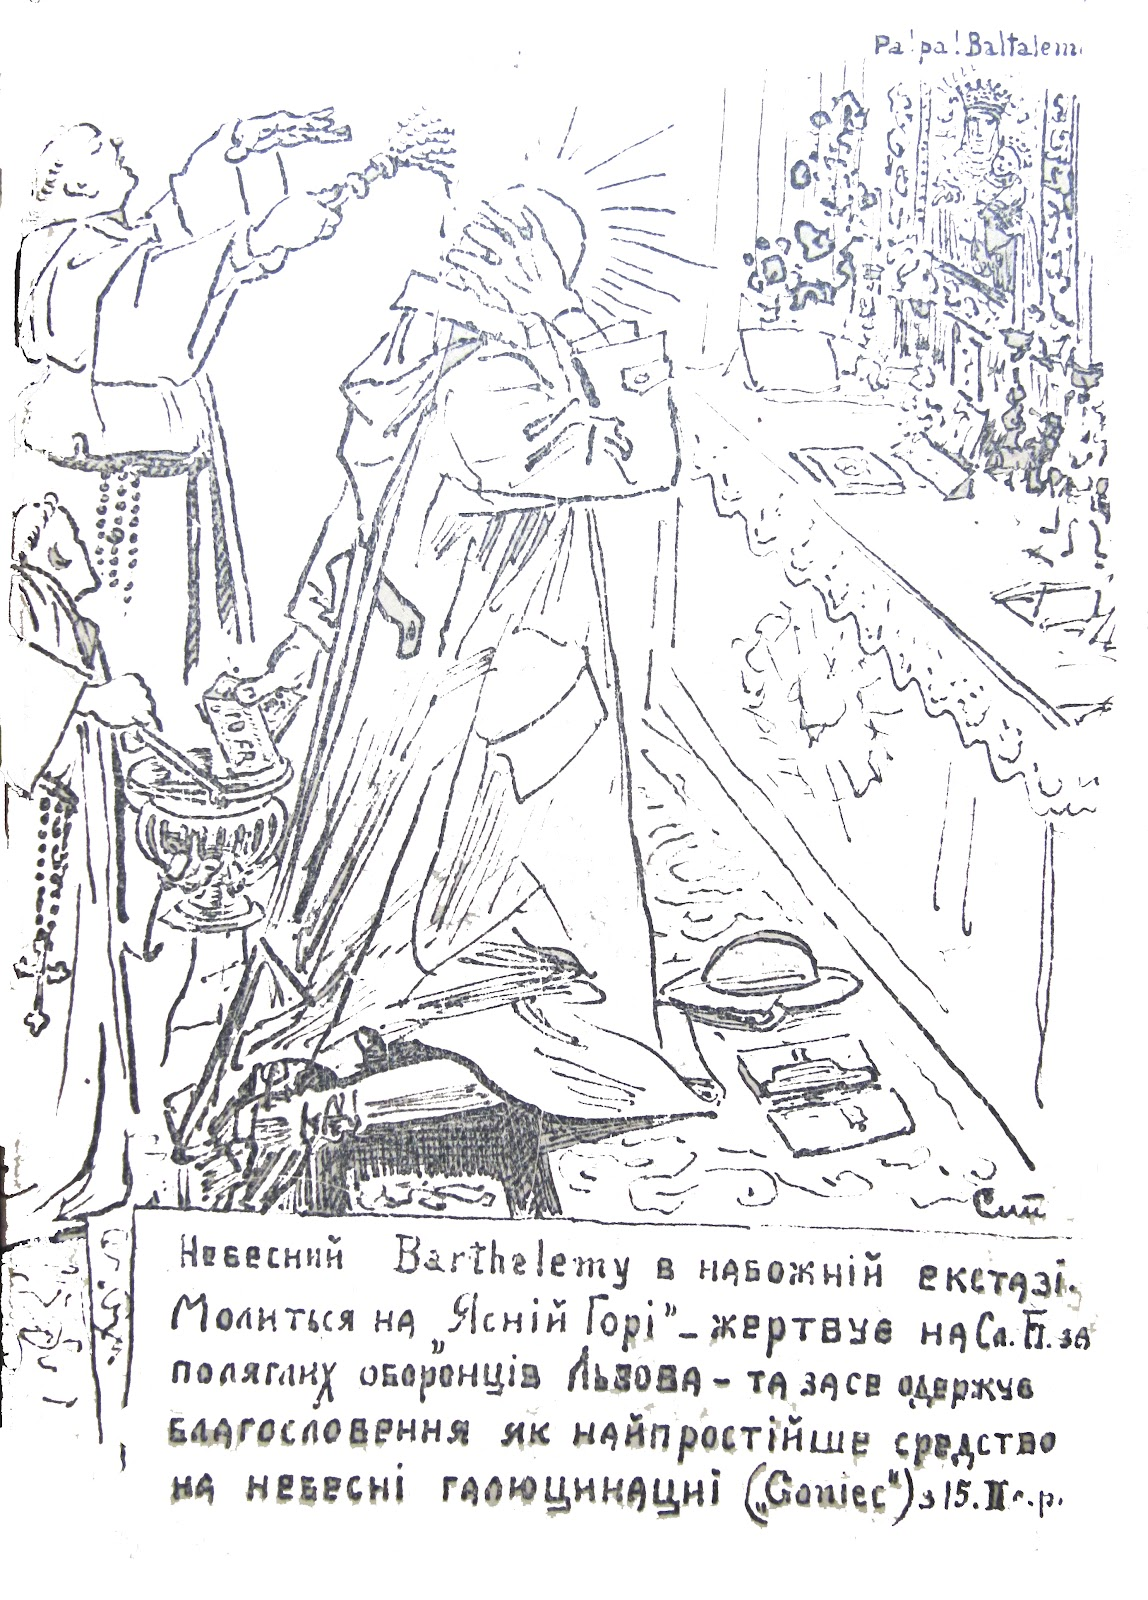 Карикатура на Ж. Бартелемі. Республіканський Самохотник. -1919. - № 5.